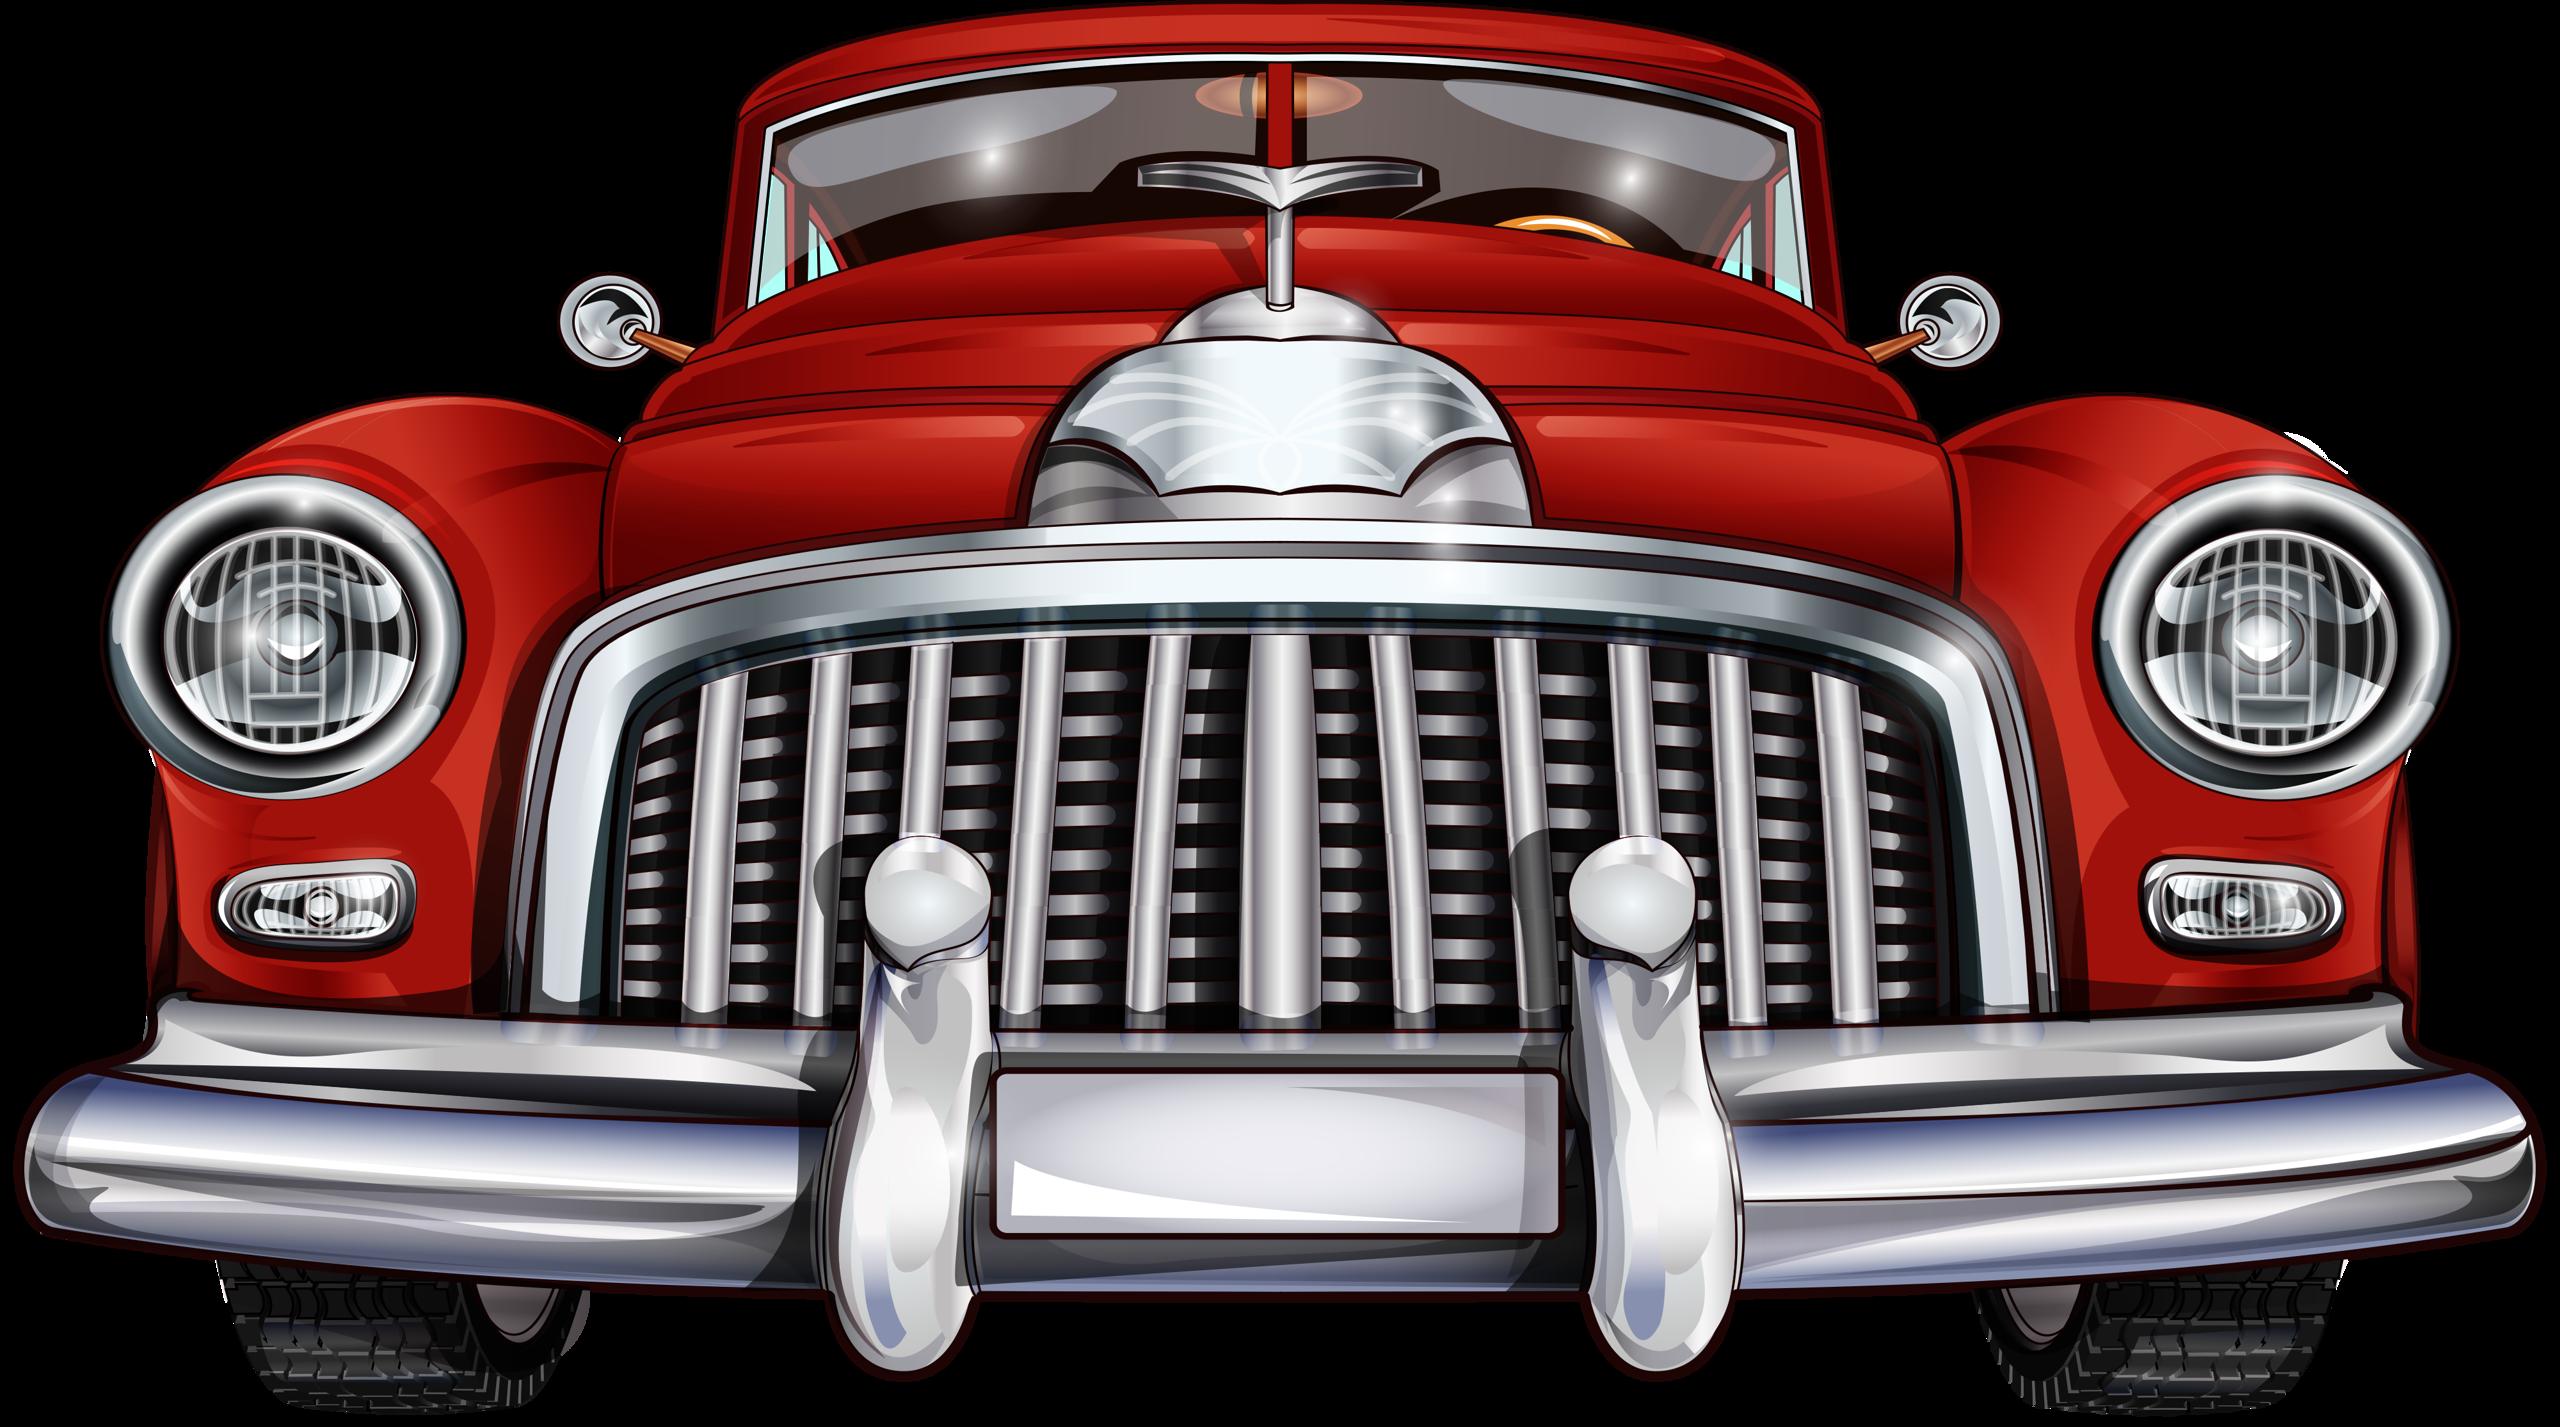 Cadillac classic car clipart free shutterstock_216055756 [преобразованный].png | Pinterest | Cars, Gas ... free